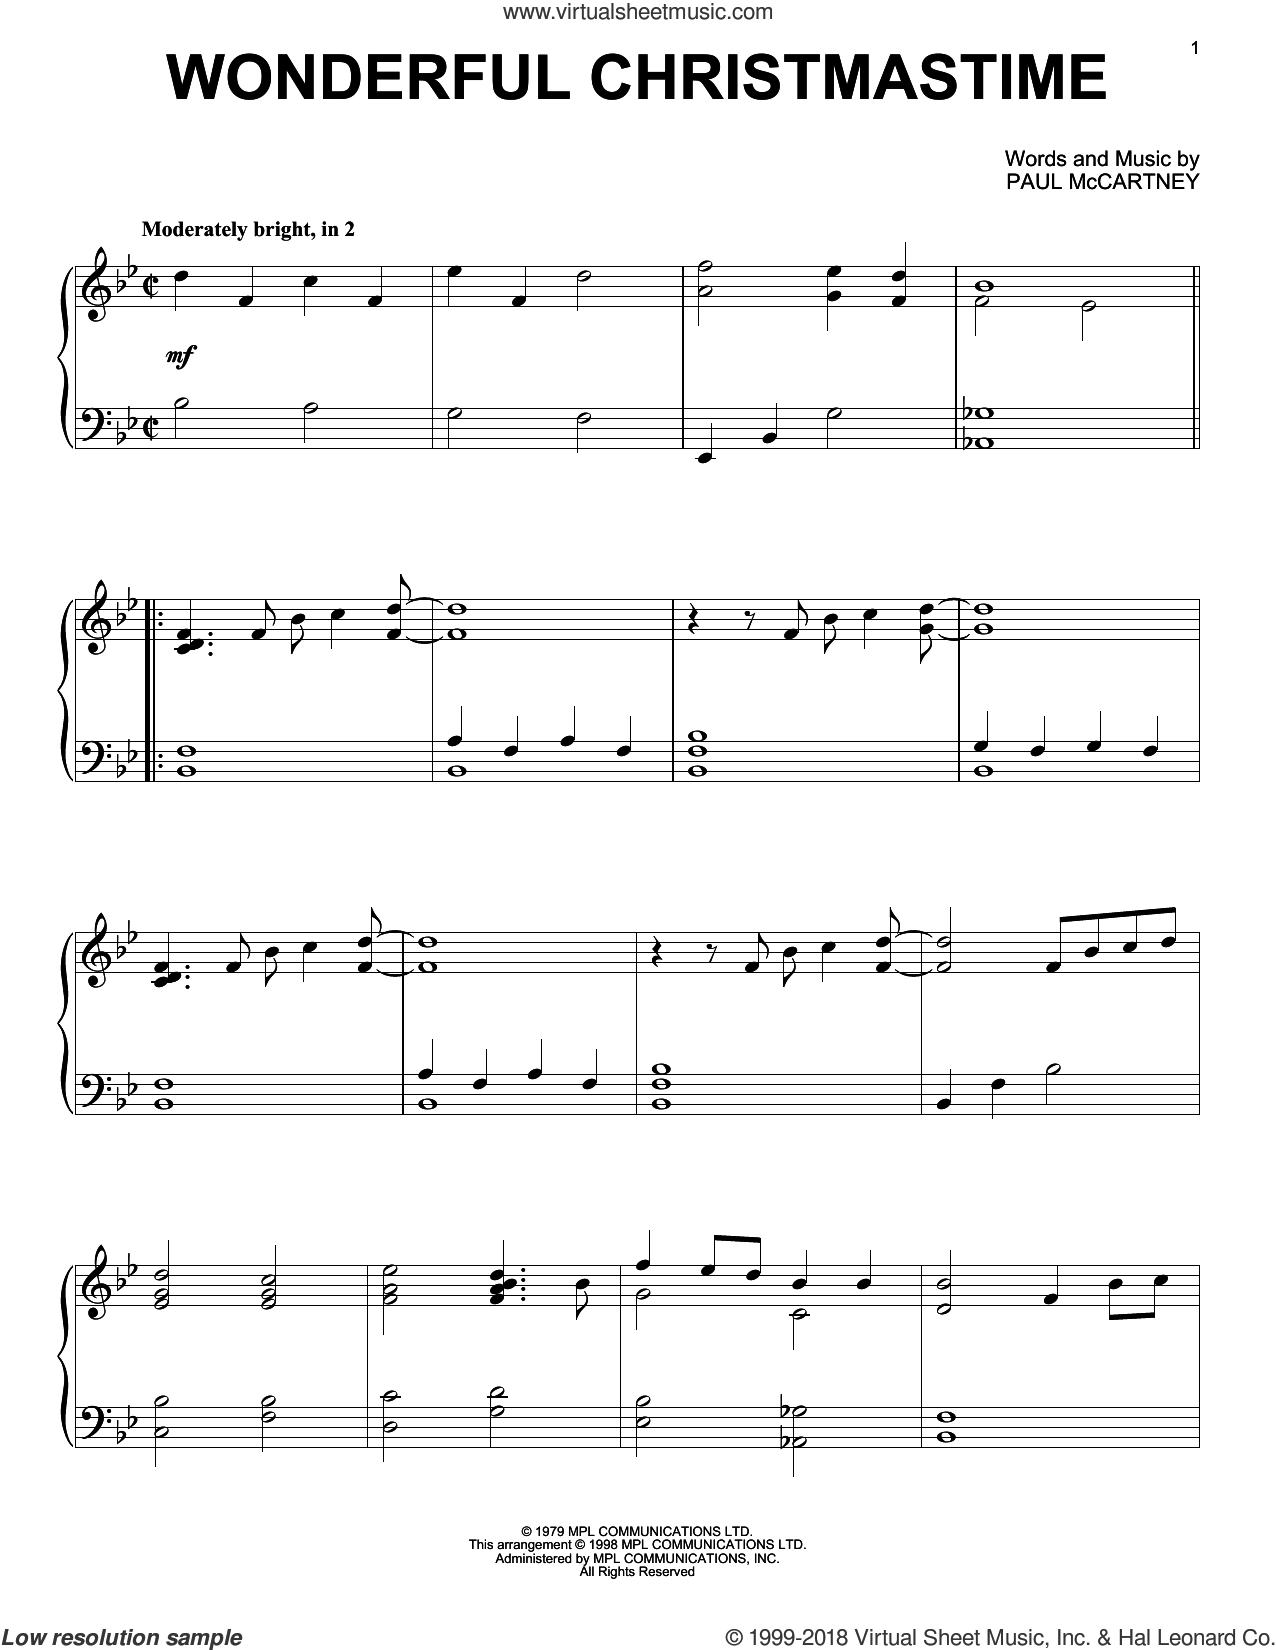 Wonderful Christmastime, (intermediate) sheet music for piano solo by Paul McCartney, intermediate skill level